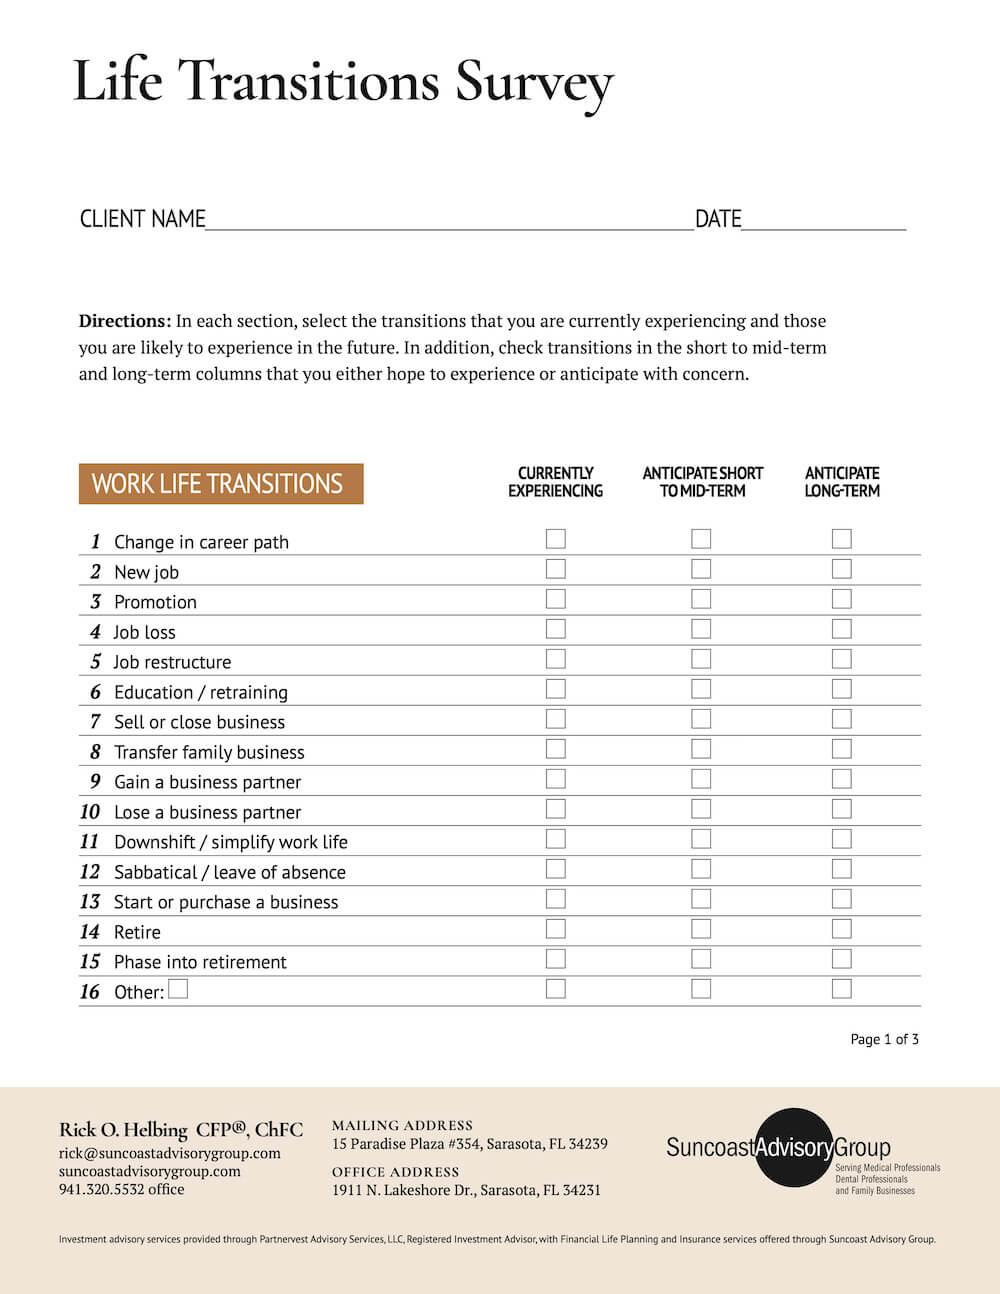 SAG_WHT_Life Transitions Survey_072419